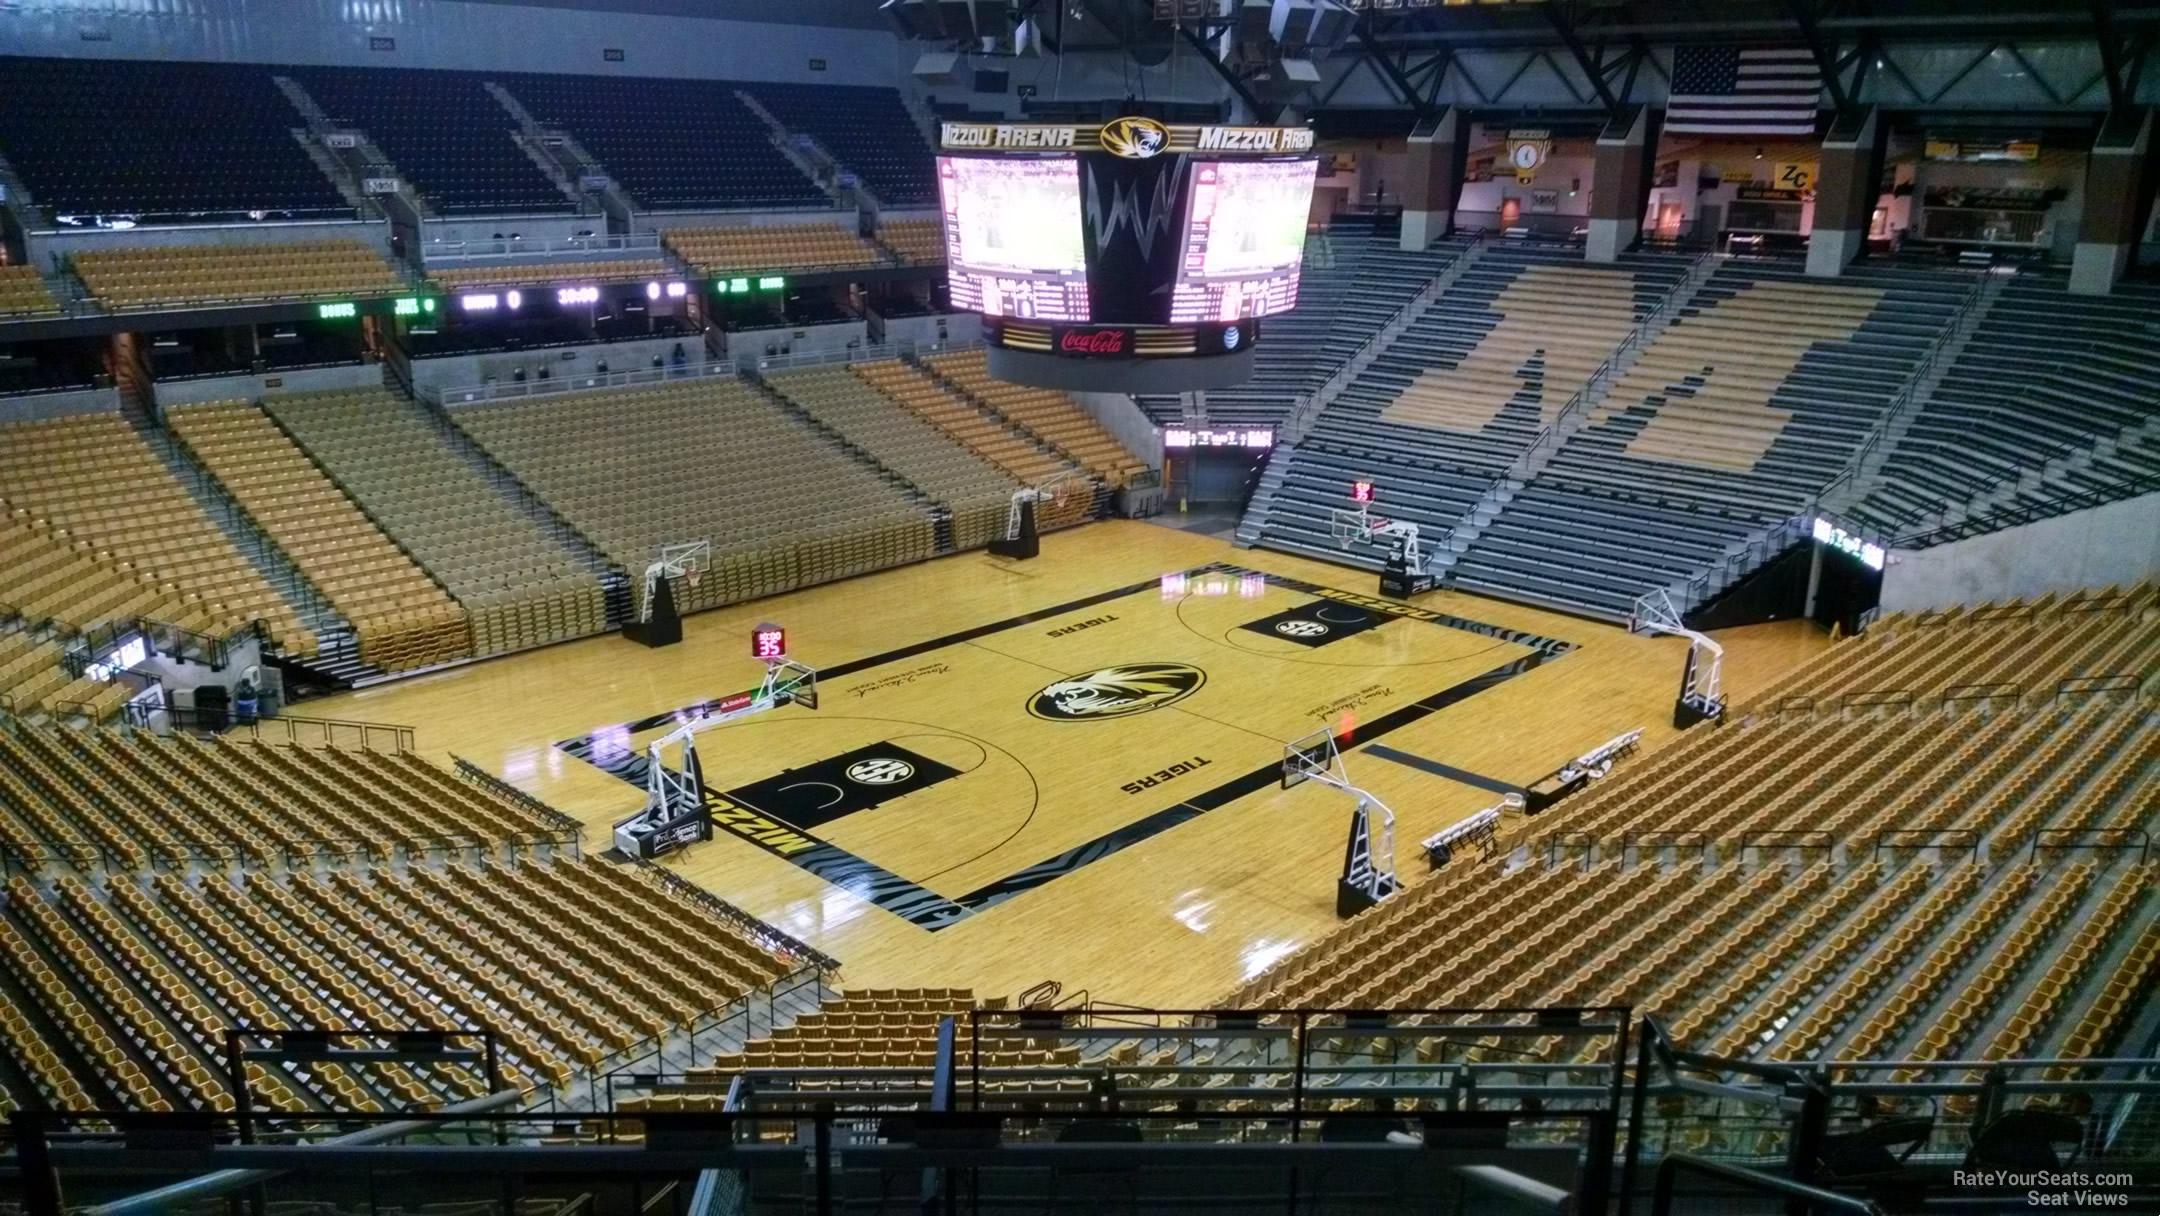 Mizzou Arena Seating Brokeasshome Com